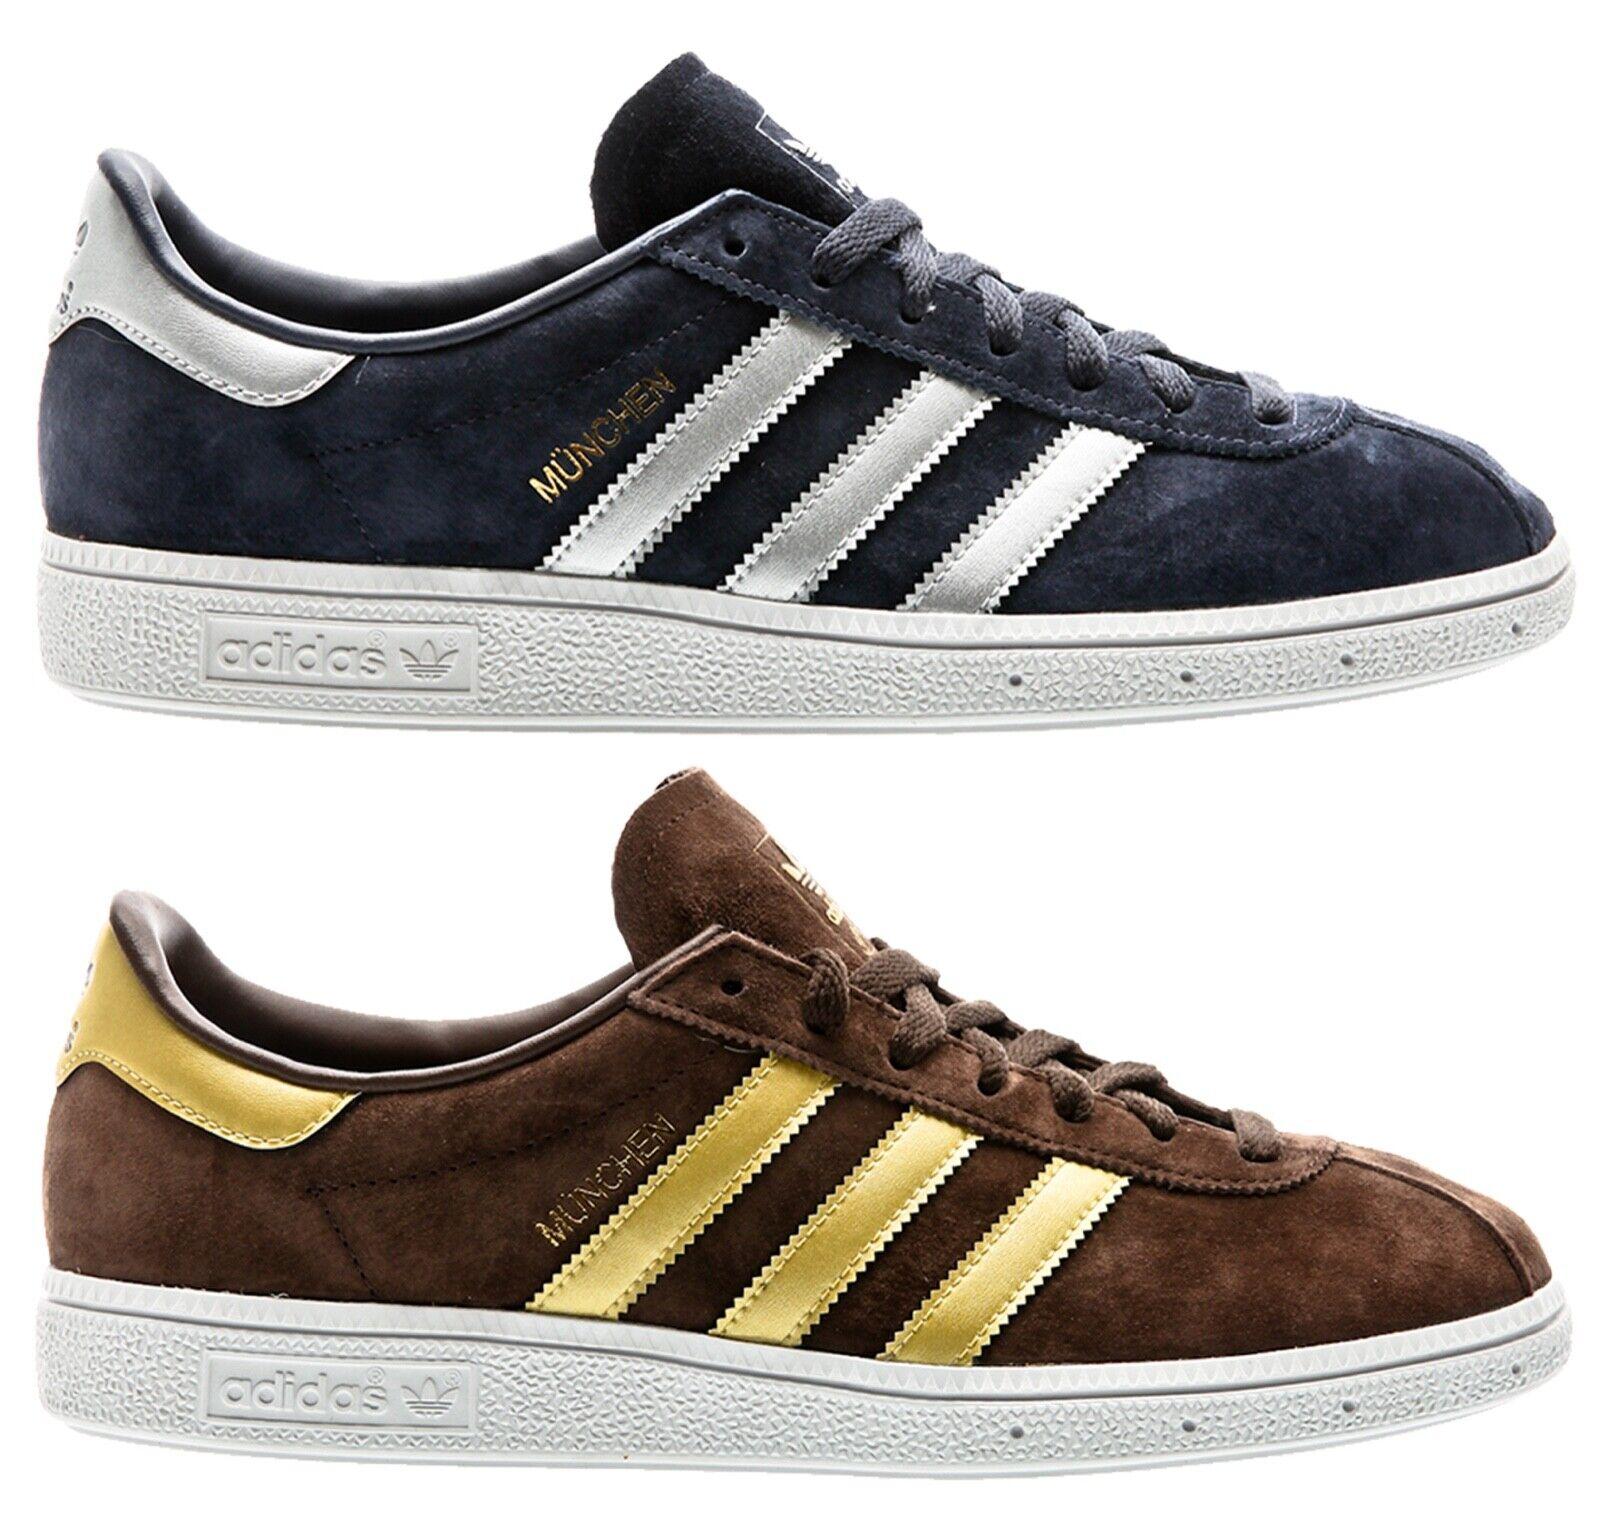 Adidas Originals Munchen Men Turnschuhe Herren Schuhe schuhe Turnschuhe